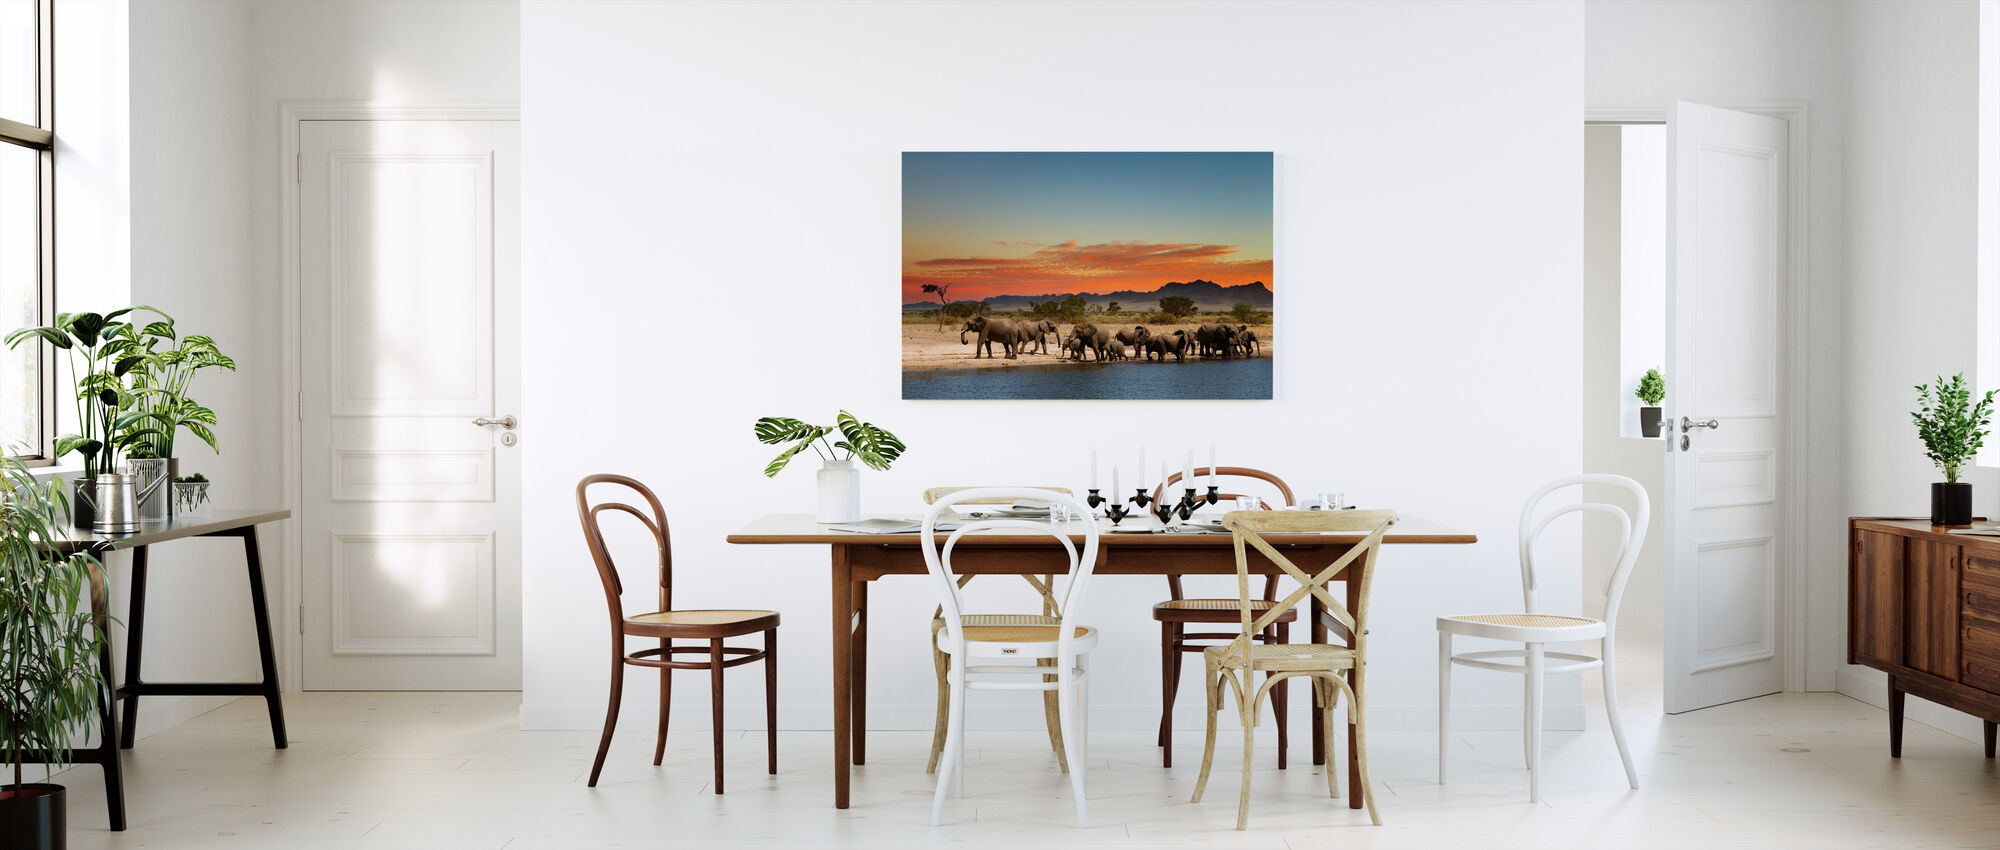 Herd of Elephants - Canvas print - Kitchen